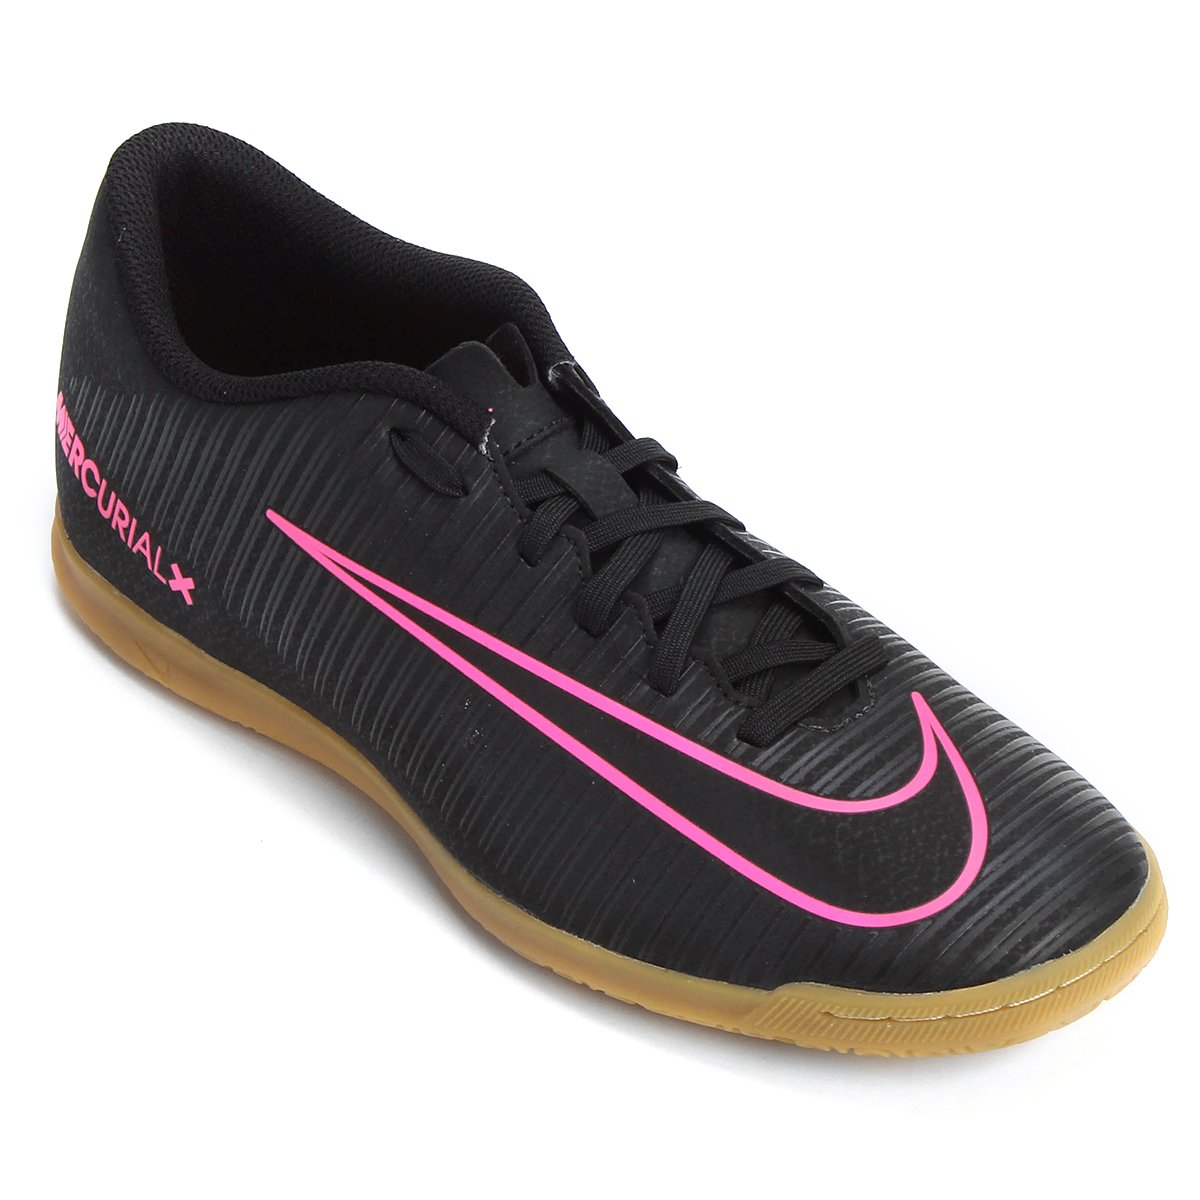 d33645d8aff5f Chuteira Futsal Nike Mercurial Vortex 3 IC - Compre Agora